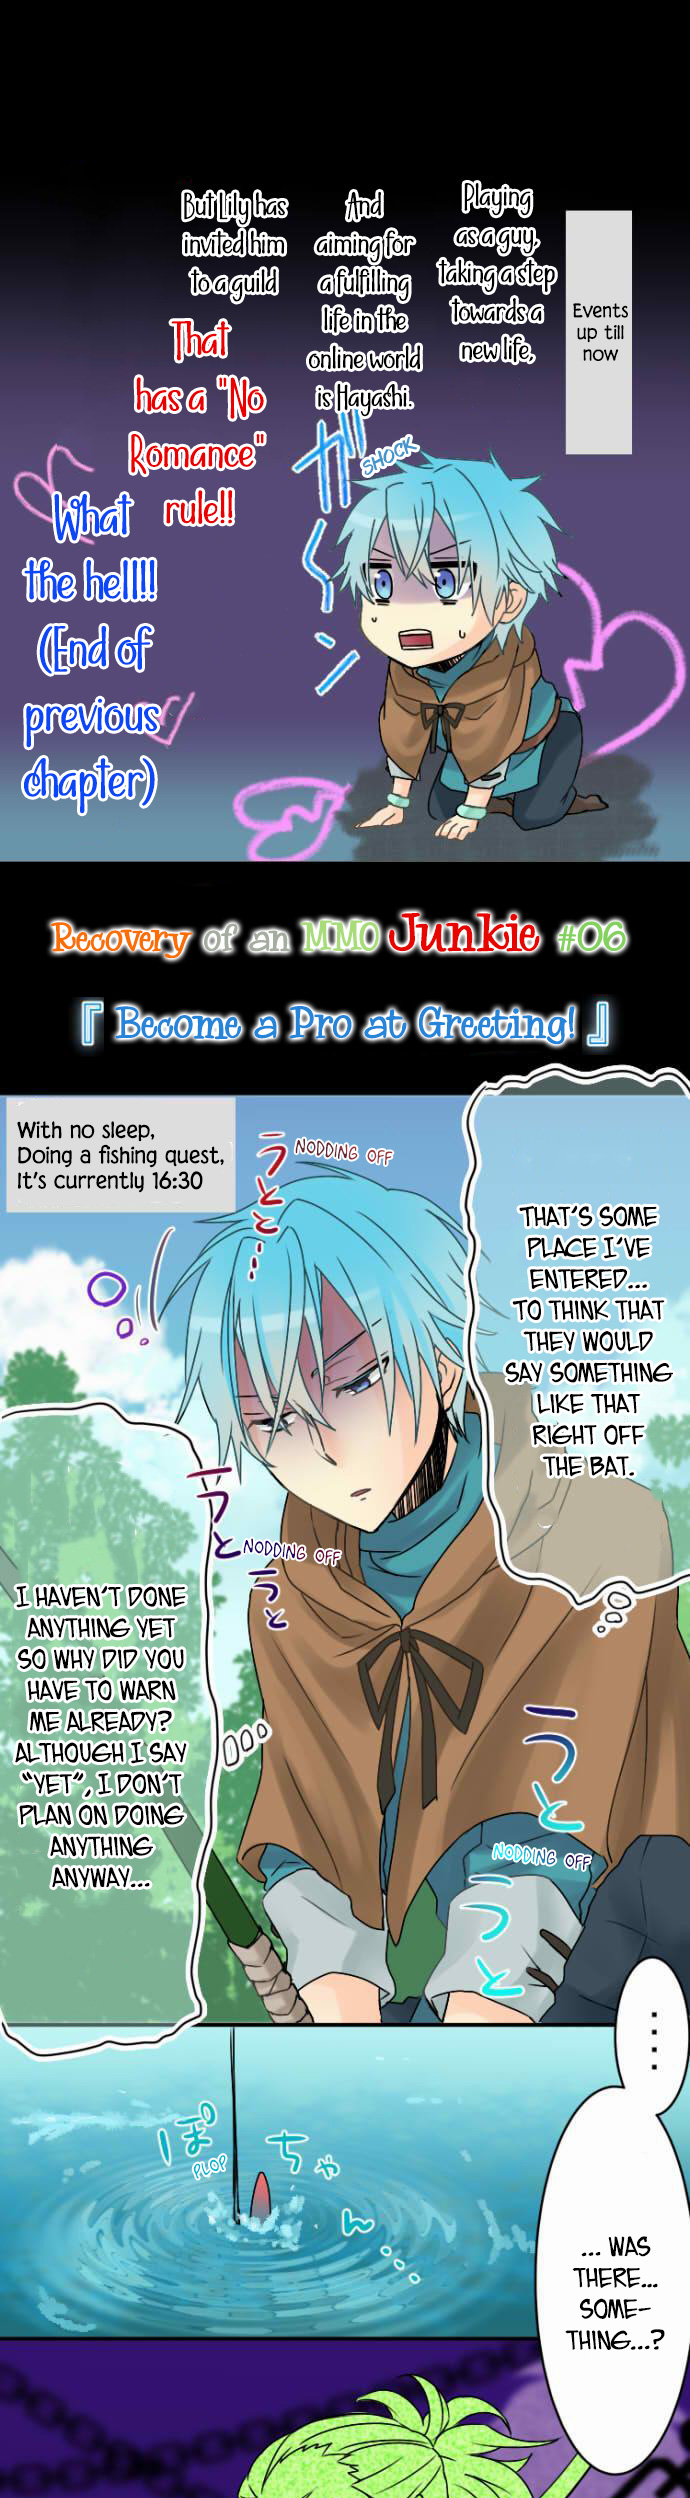 Netojuu no Susume - Chapter 6